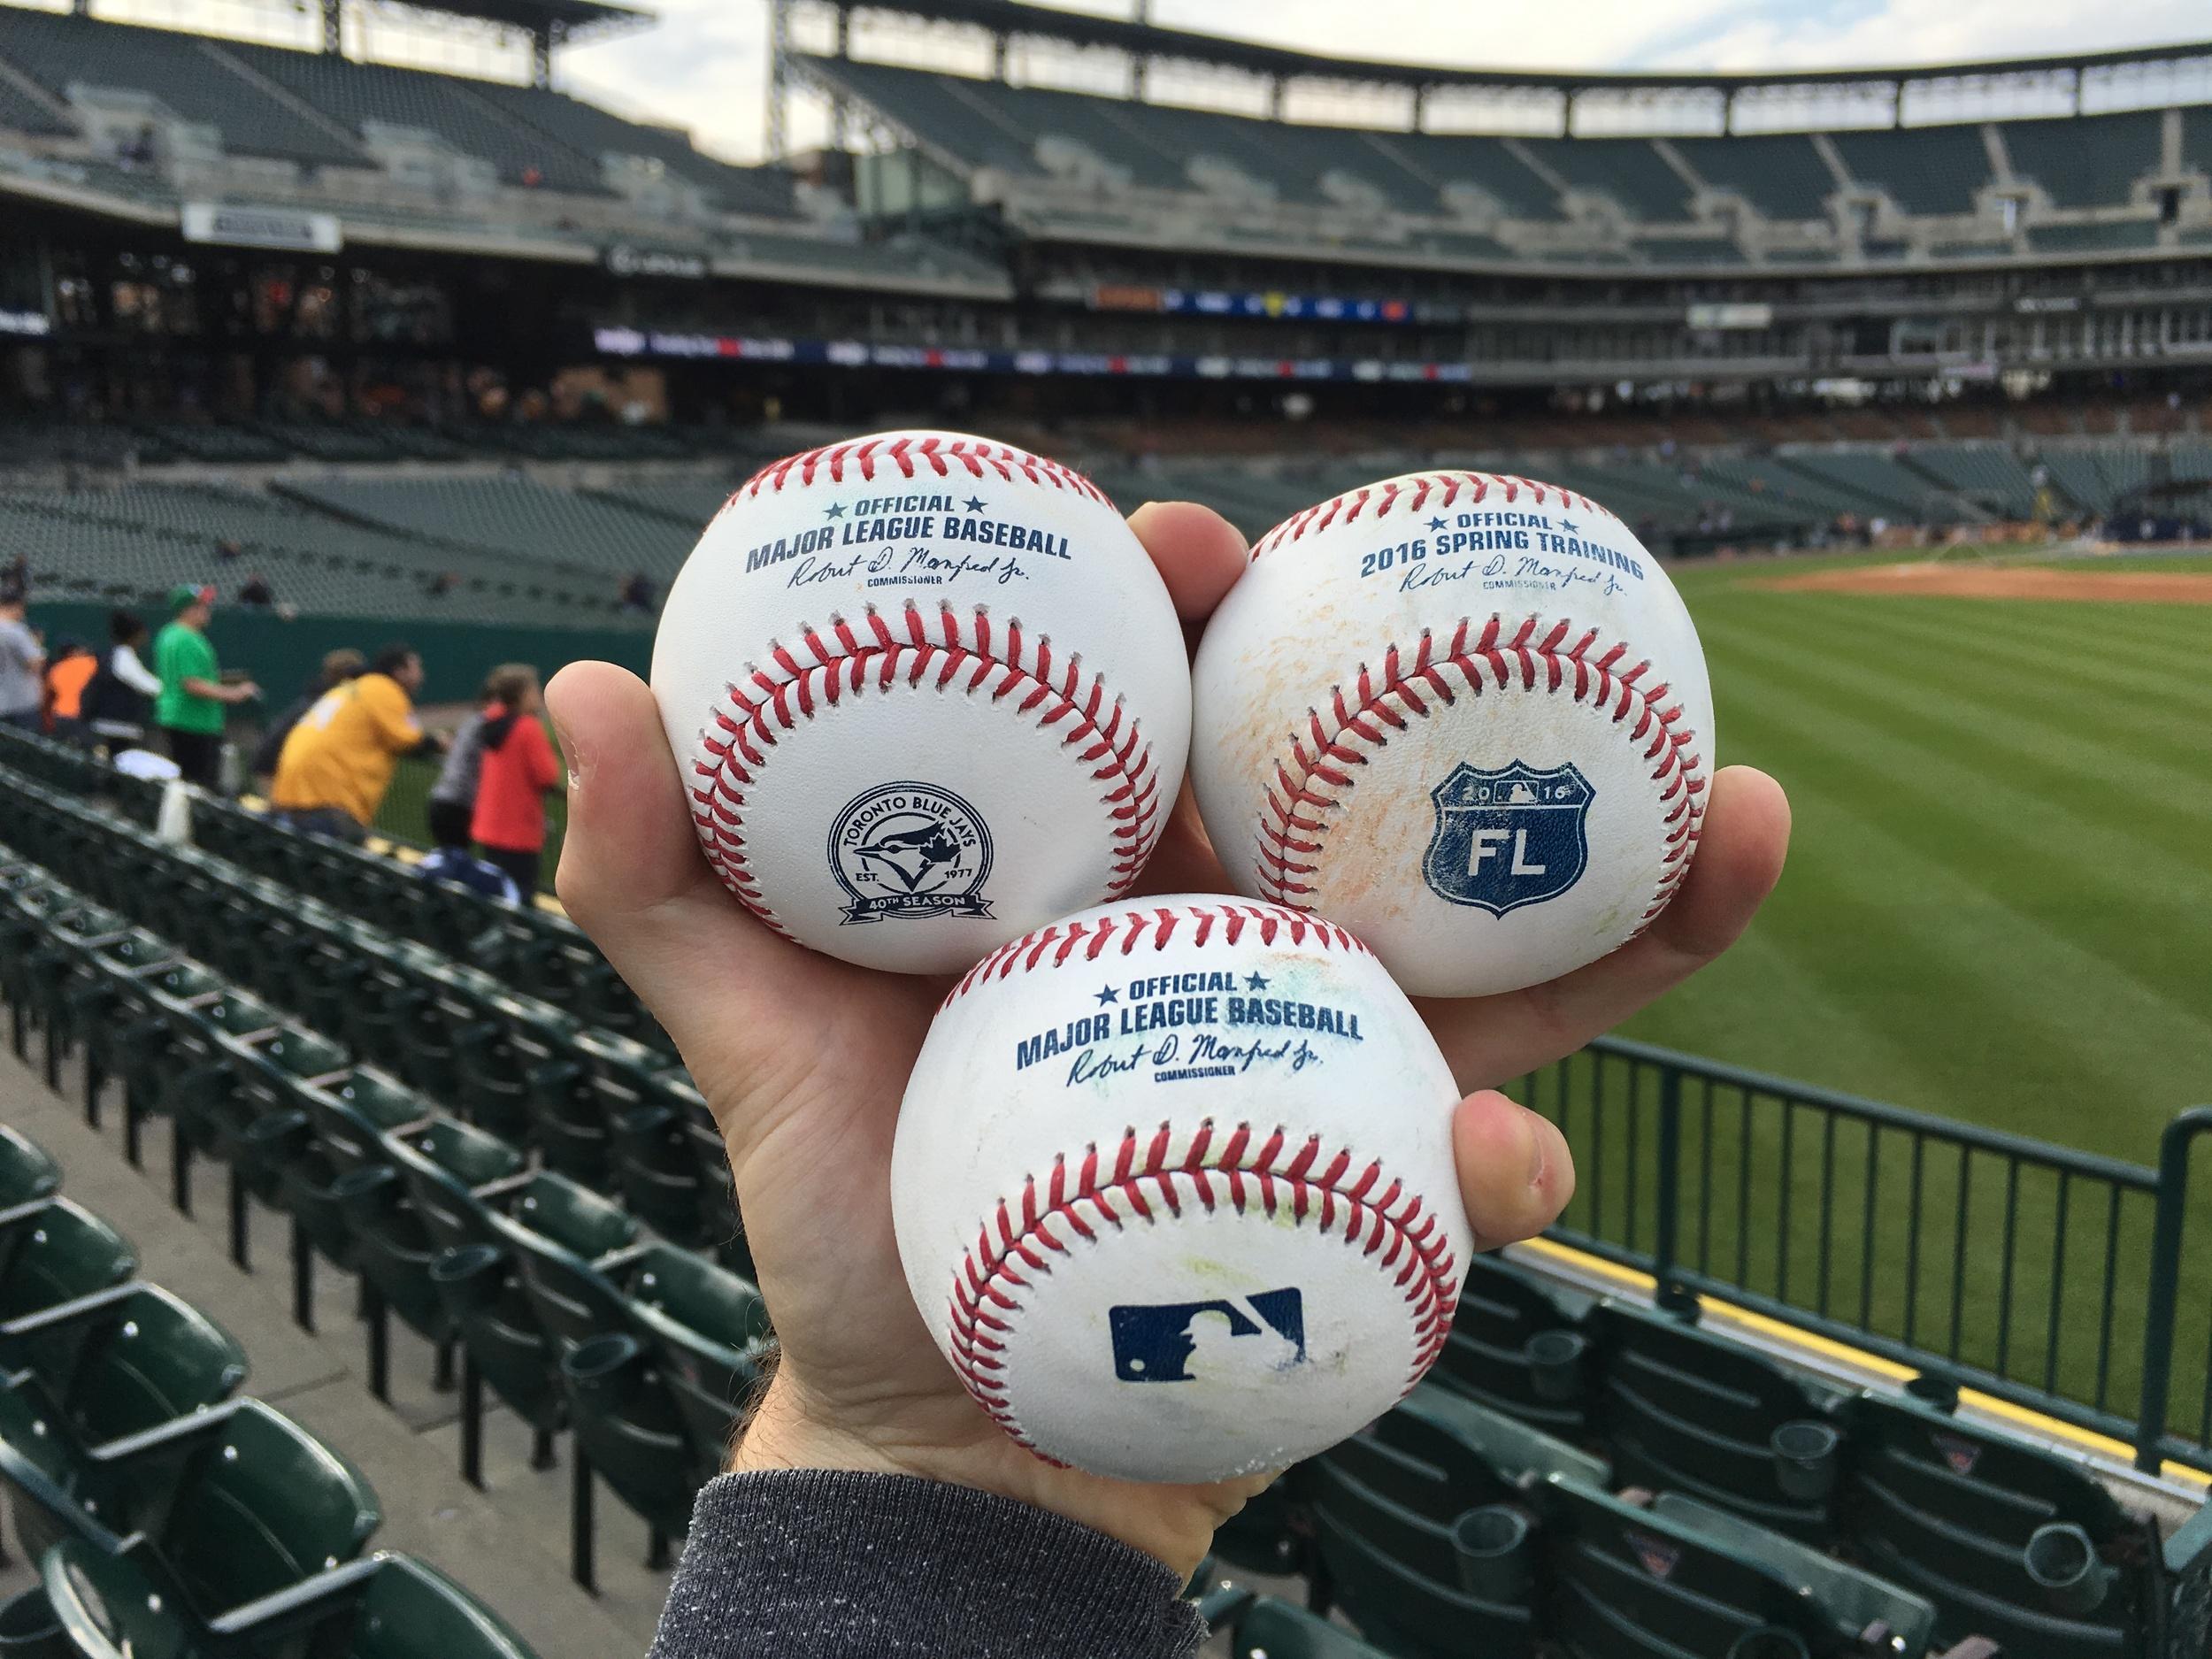 53_nice_variety_of_baseballs.JPG